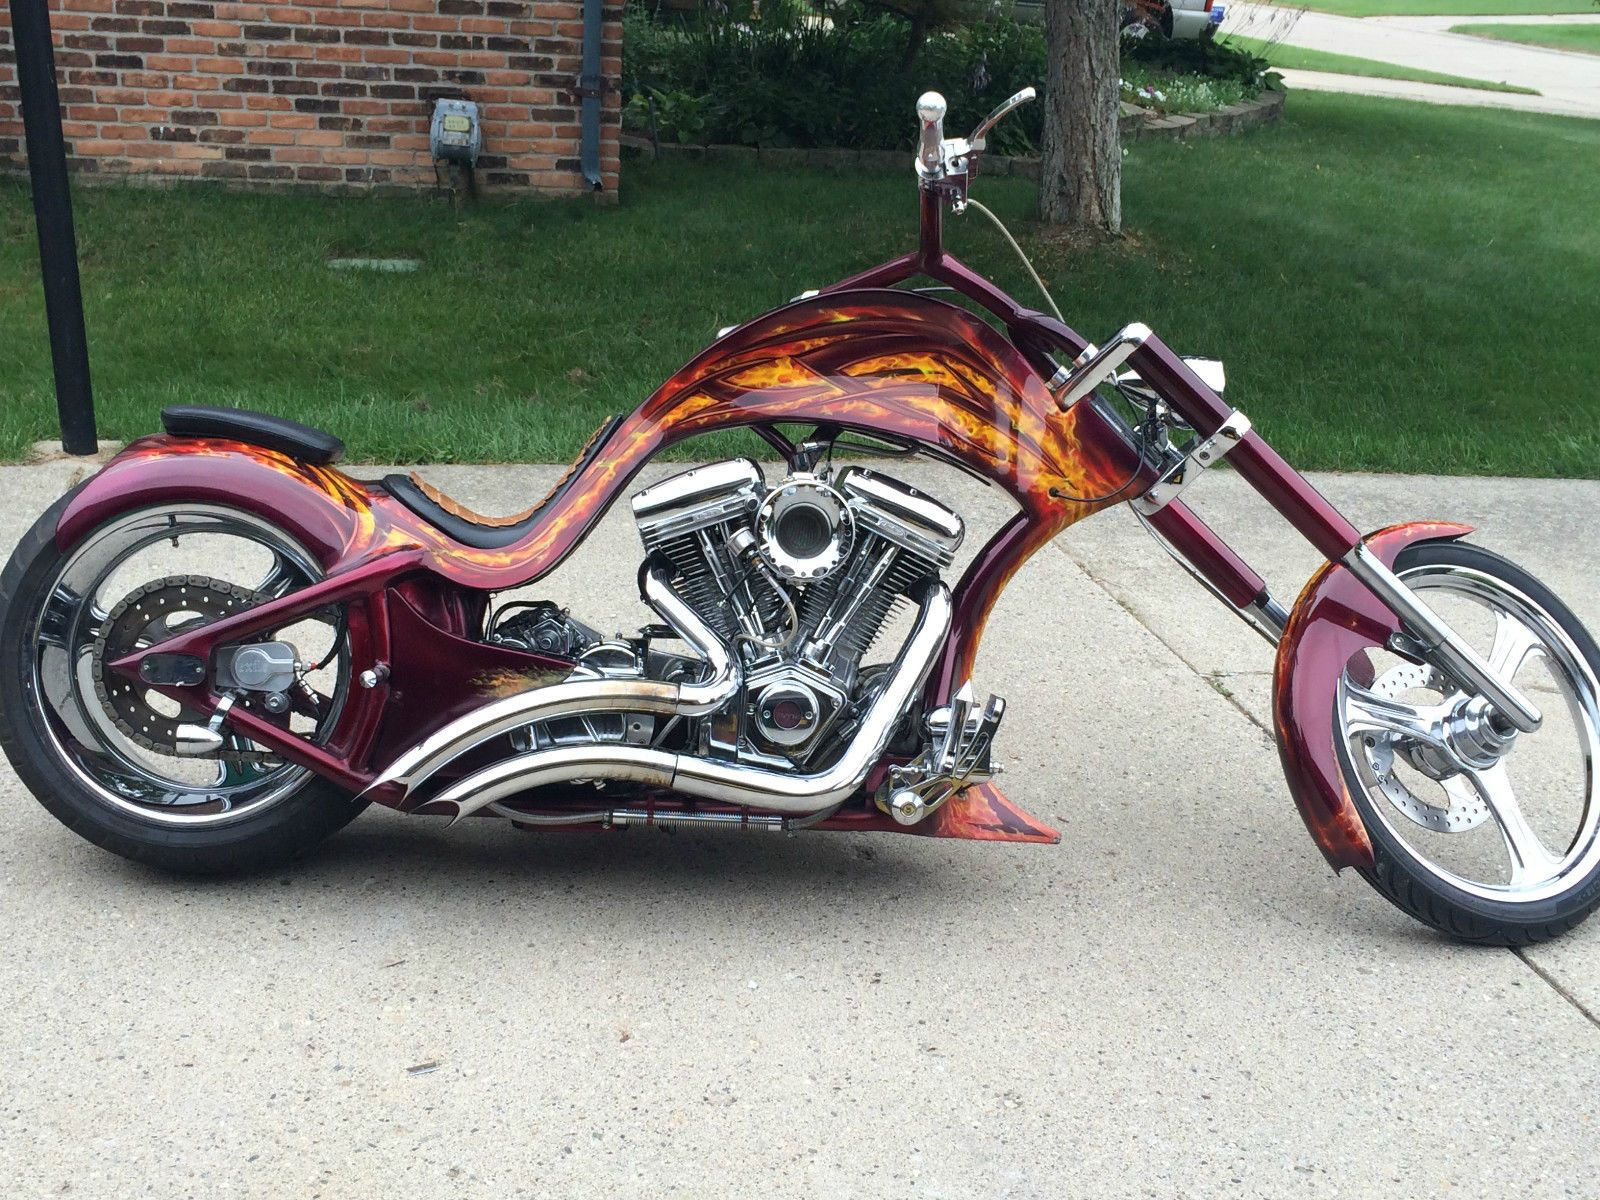 Ebay Motors Motorcycles >> Custom Built Motorcycles Home Ebay Motors Motorcycles Custom Built